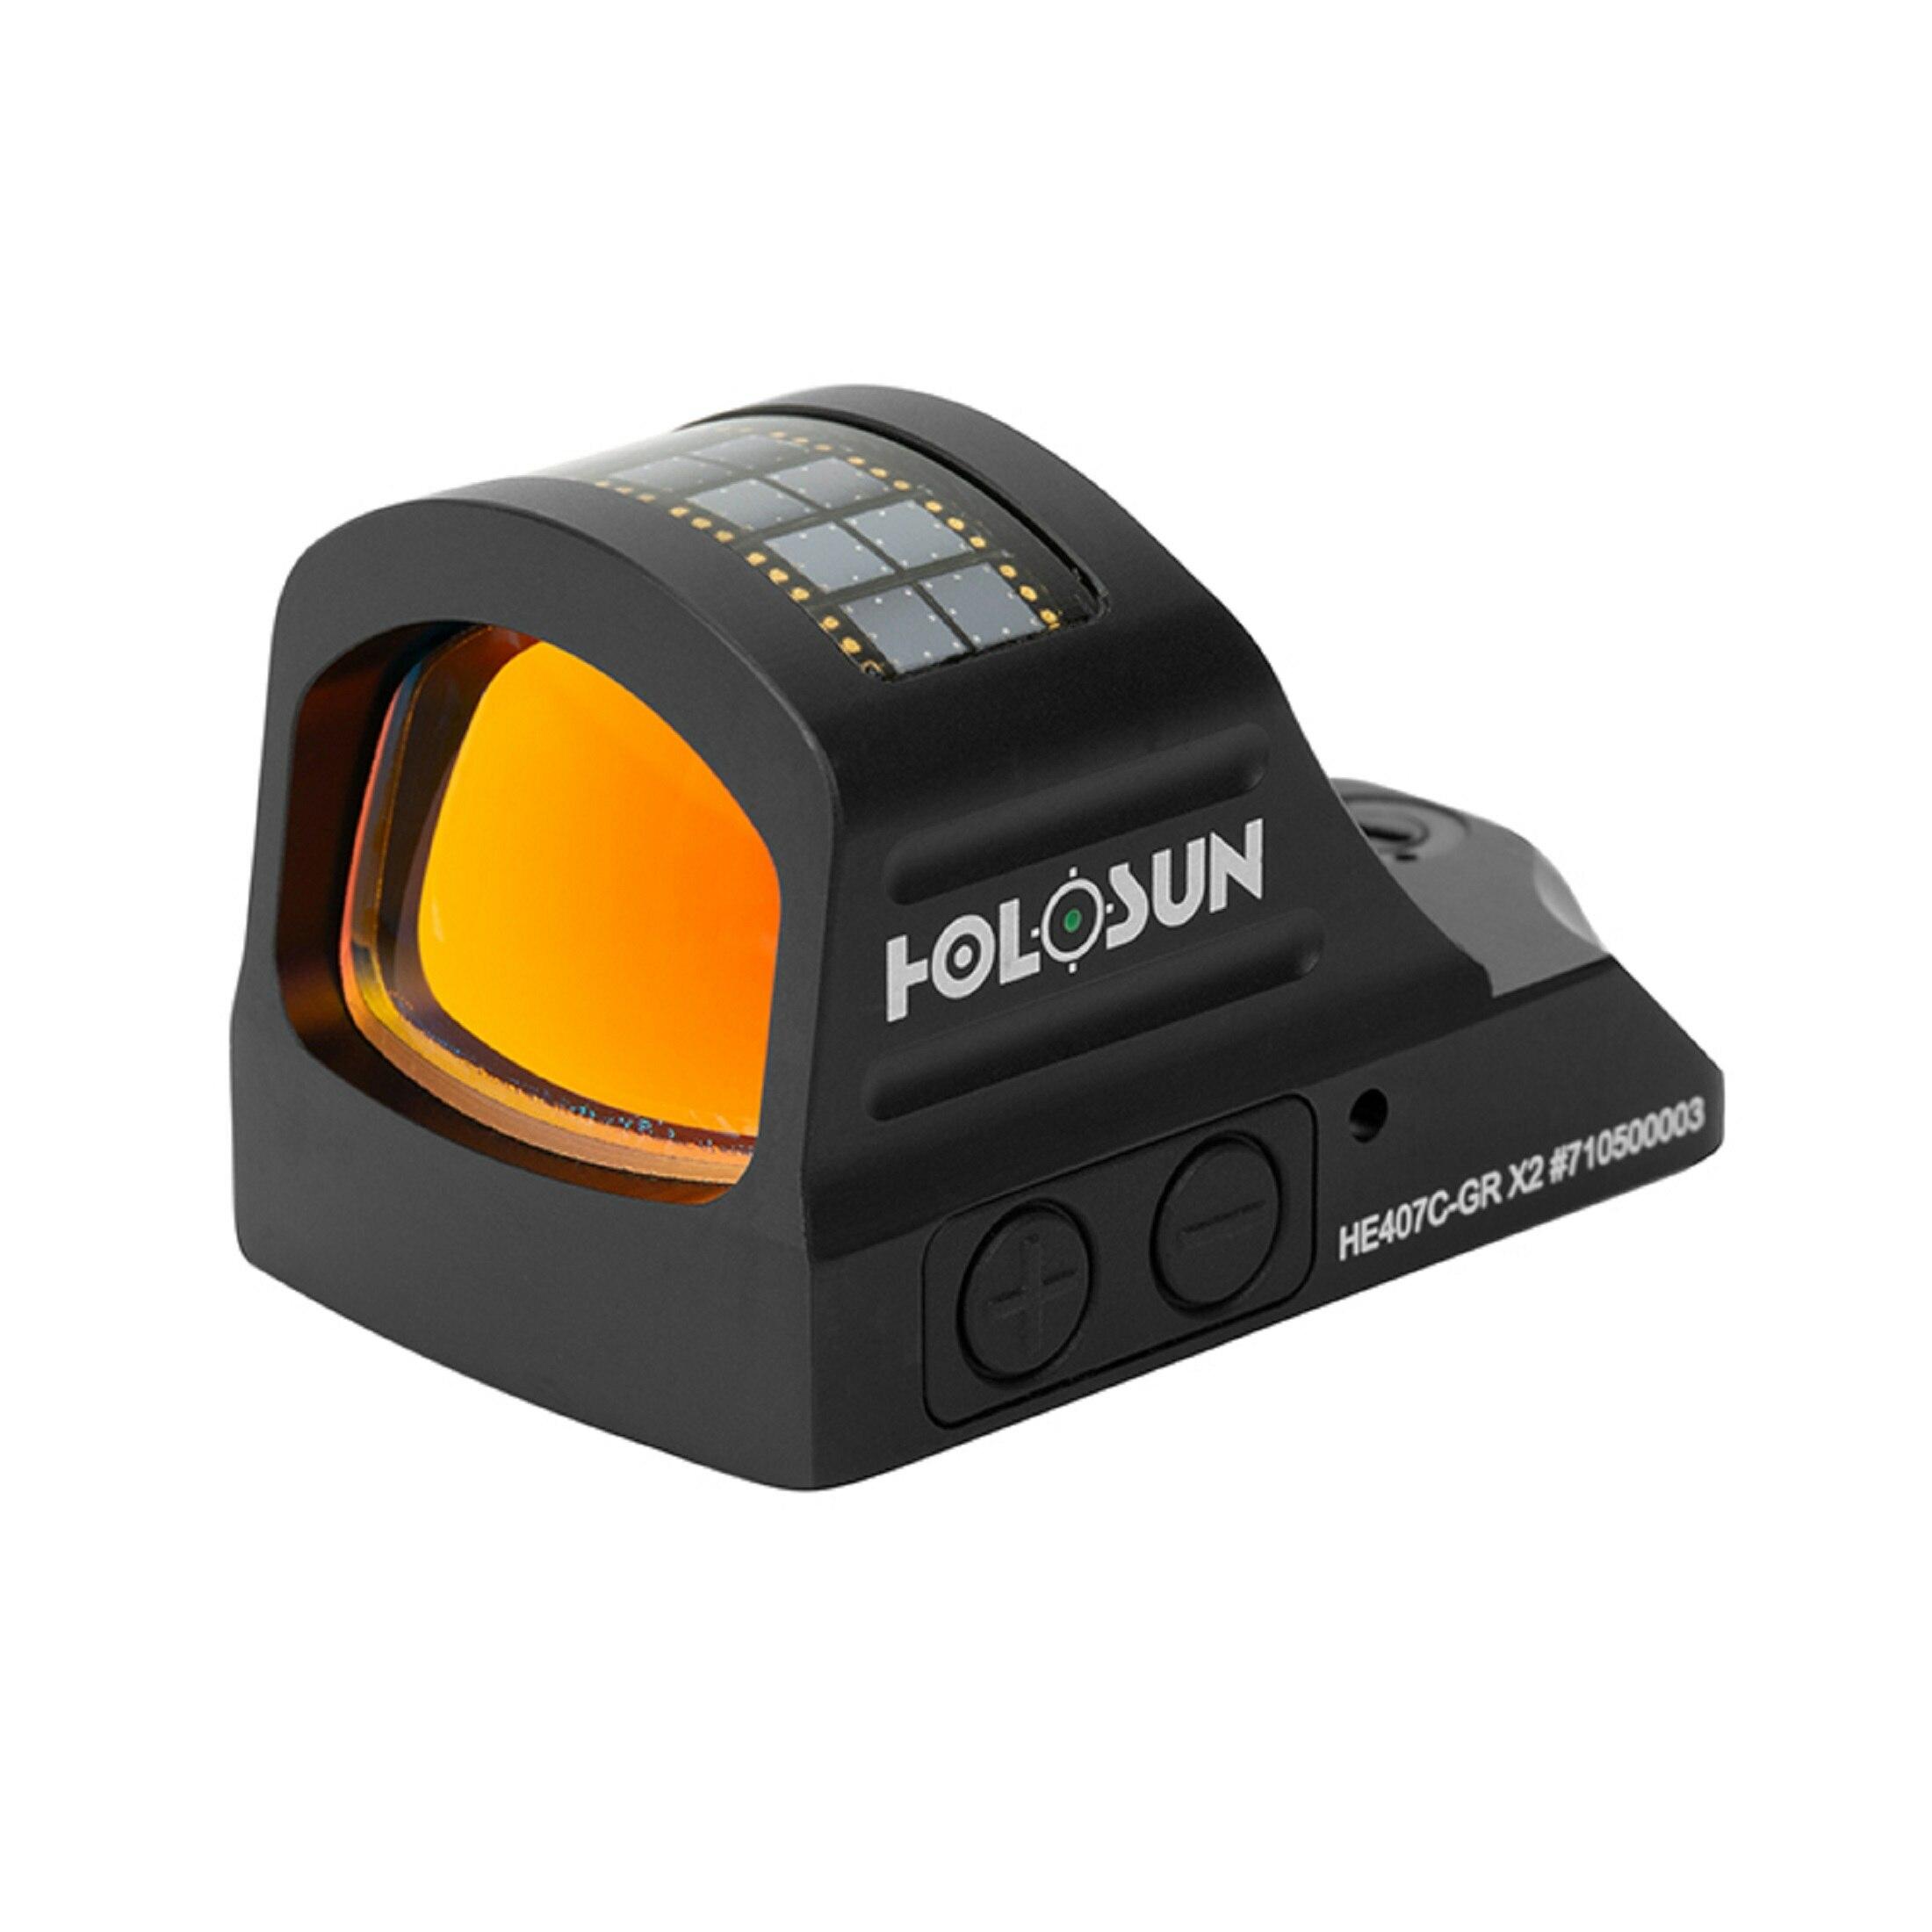 Holosun Dot Sight ELITE HE407C-GR-X2